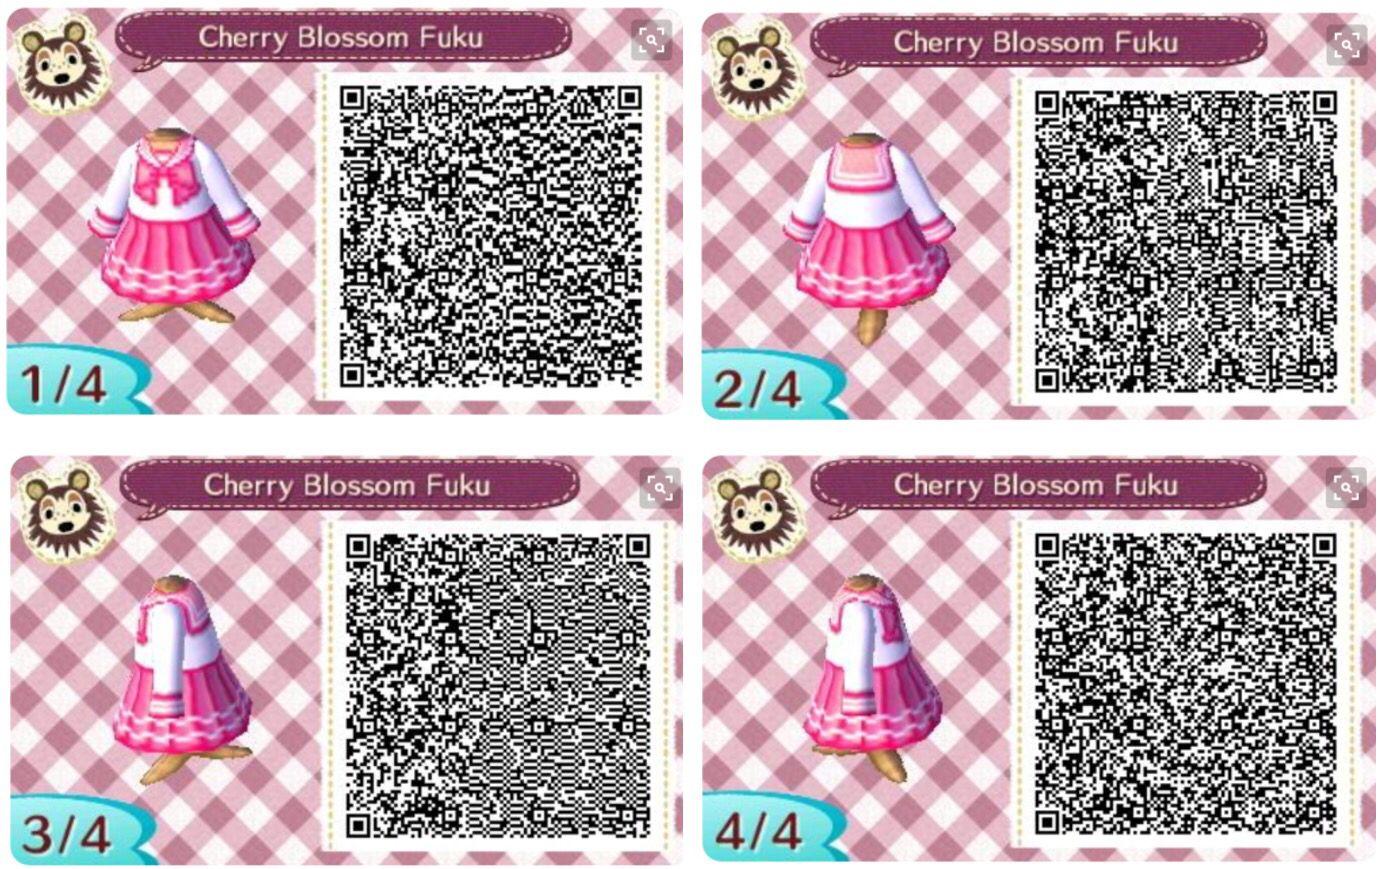 Bien-aimé Animal Crossing New Leaf: QR Code dress Cherry blossom fuku  IQ12